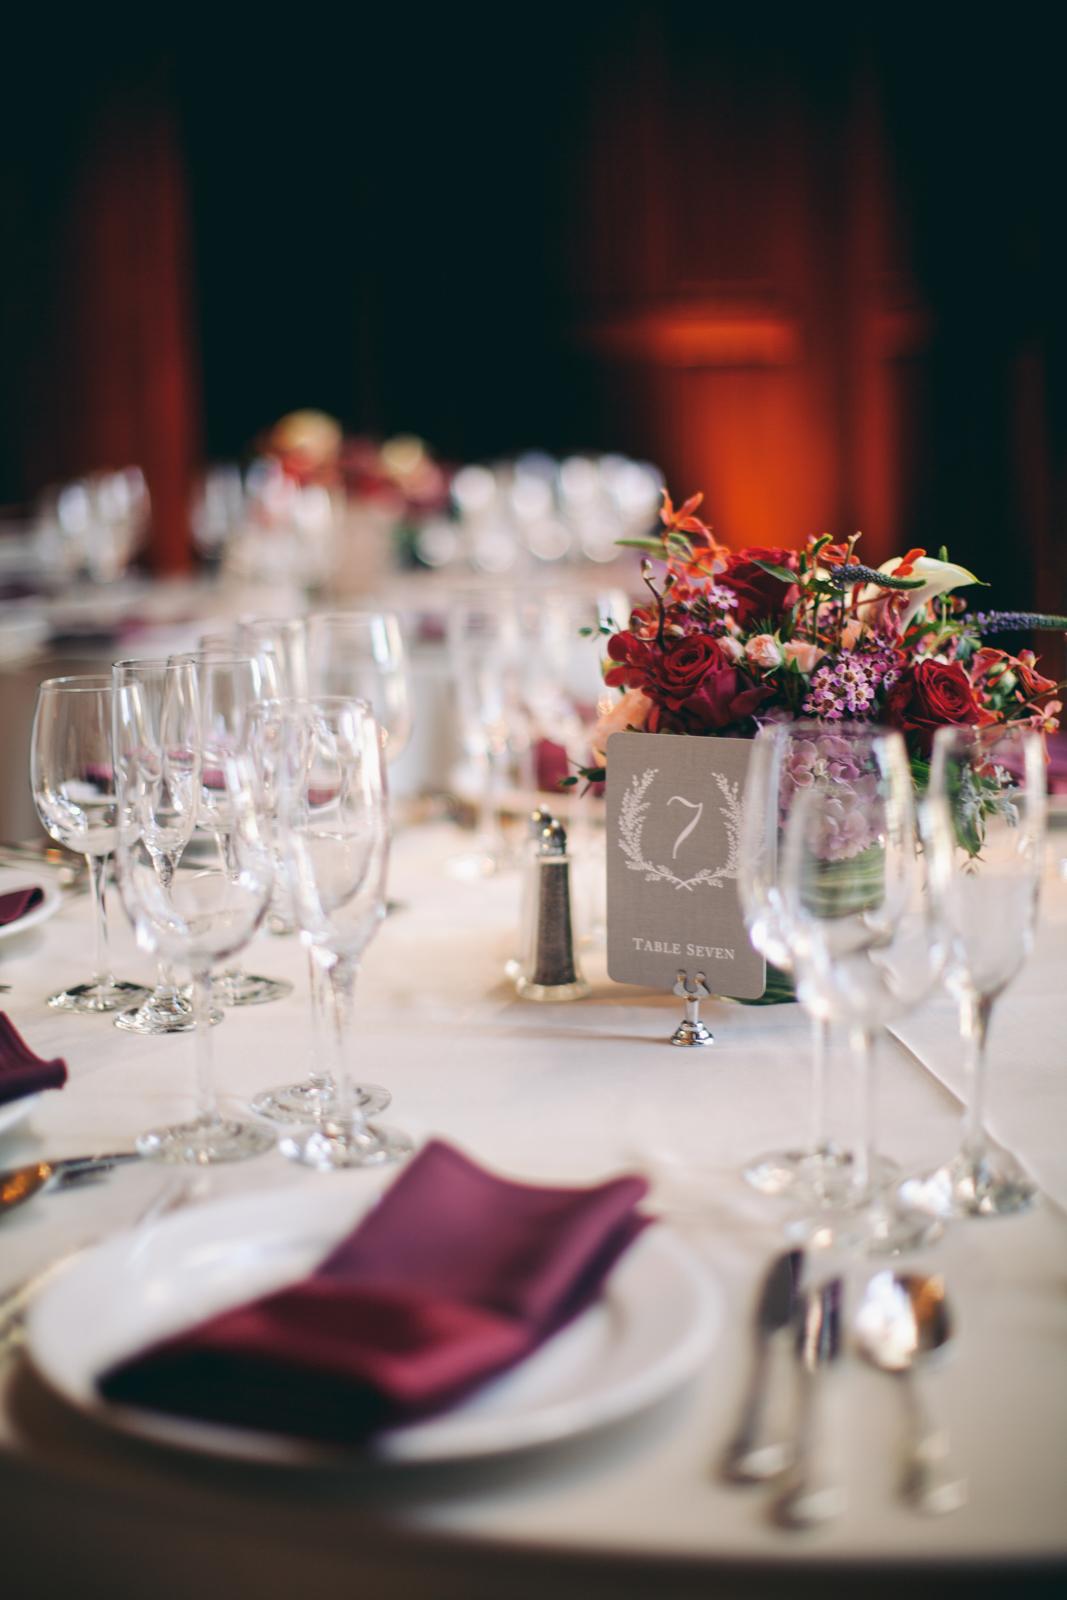 kohl_manison_wedding_photography_sarah_eric_ebony_siovhan_bokeh_photography_078.jpg